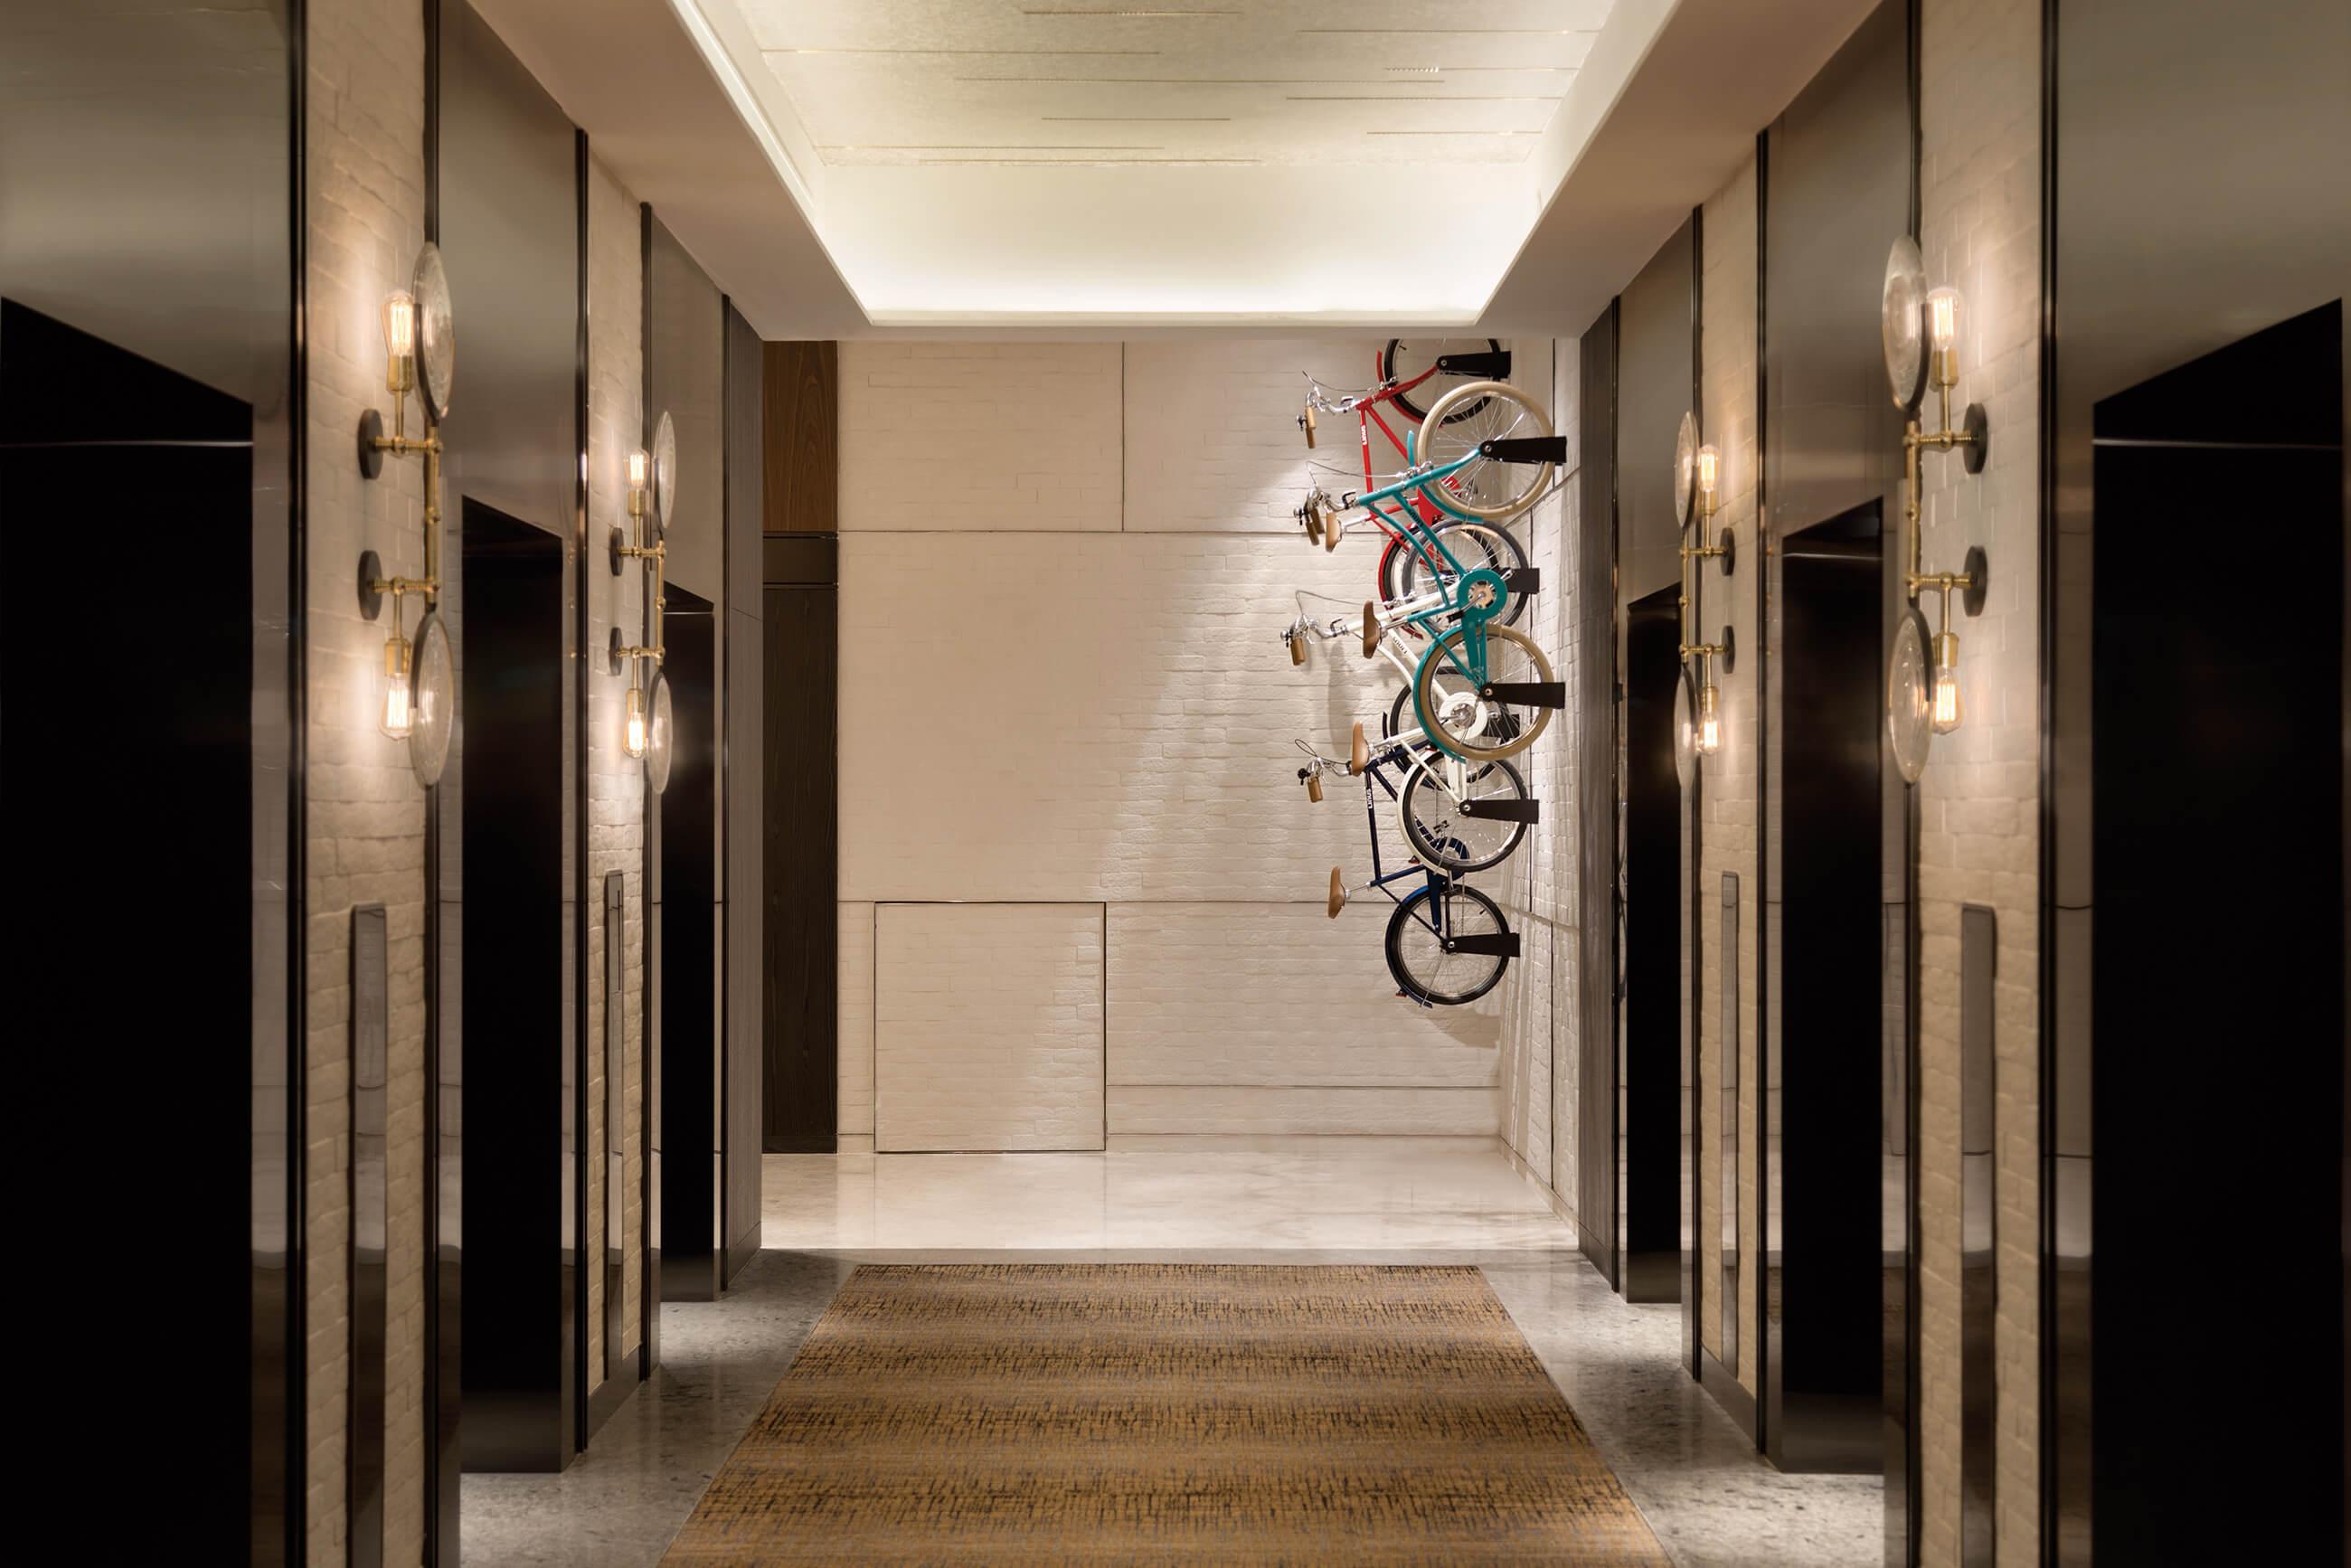 https://bubo.sk/uploads/galleries/7468/jen_tanglin_hotel_izby.jpg